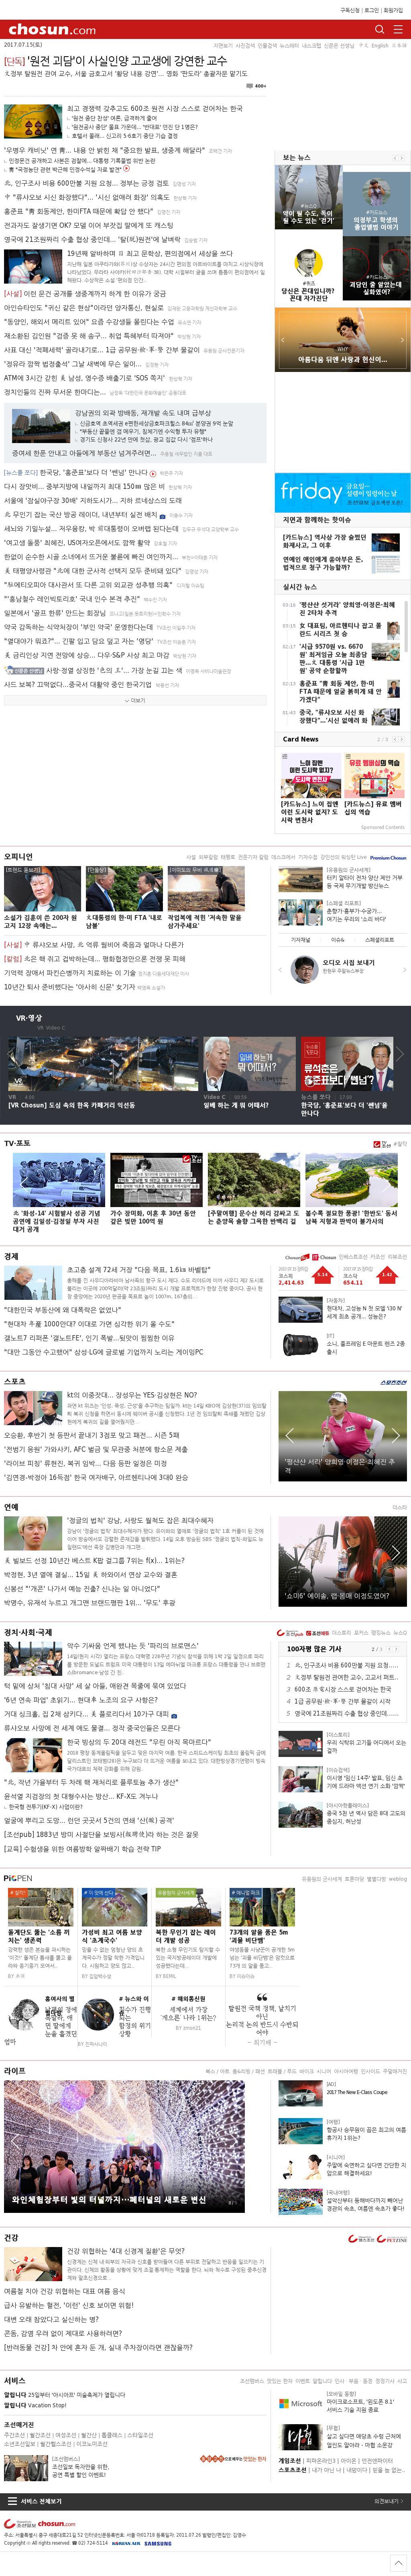 chosun.com at Saturday July 15, 2017, 4:02 a.m. UTC